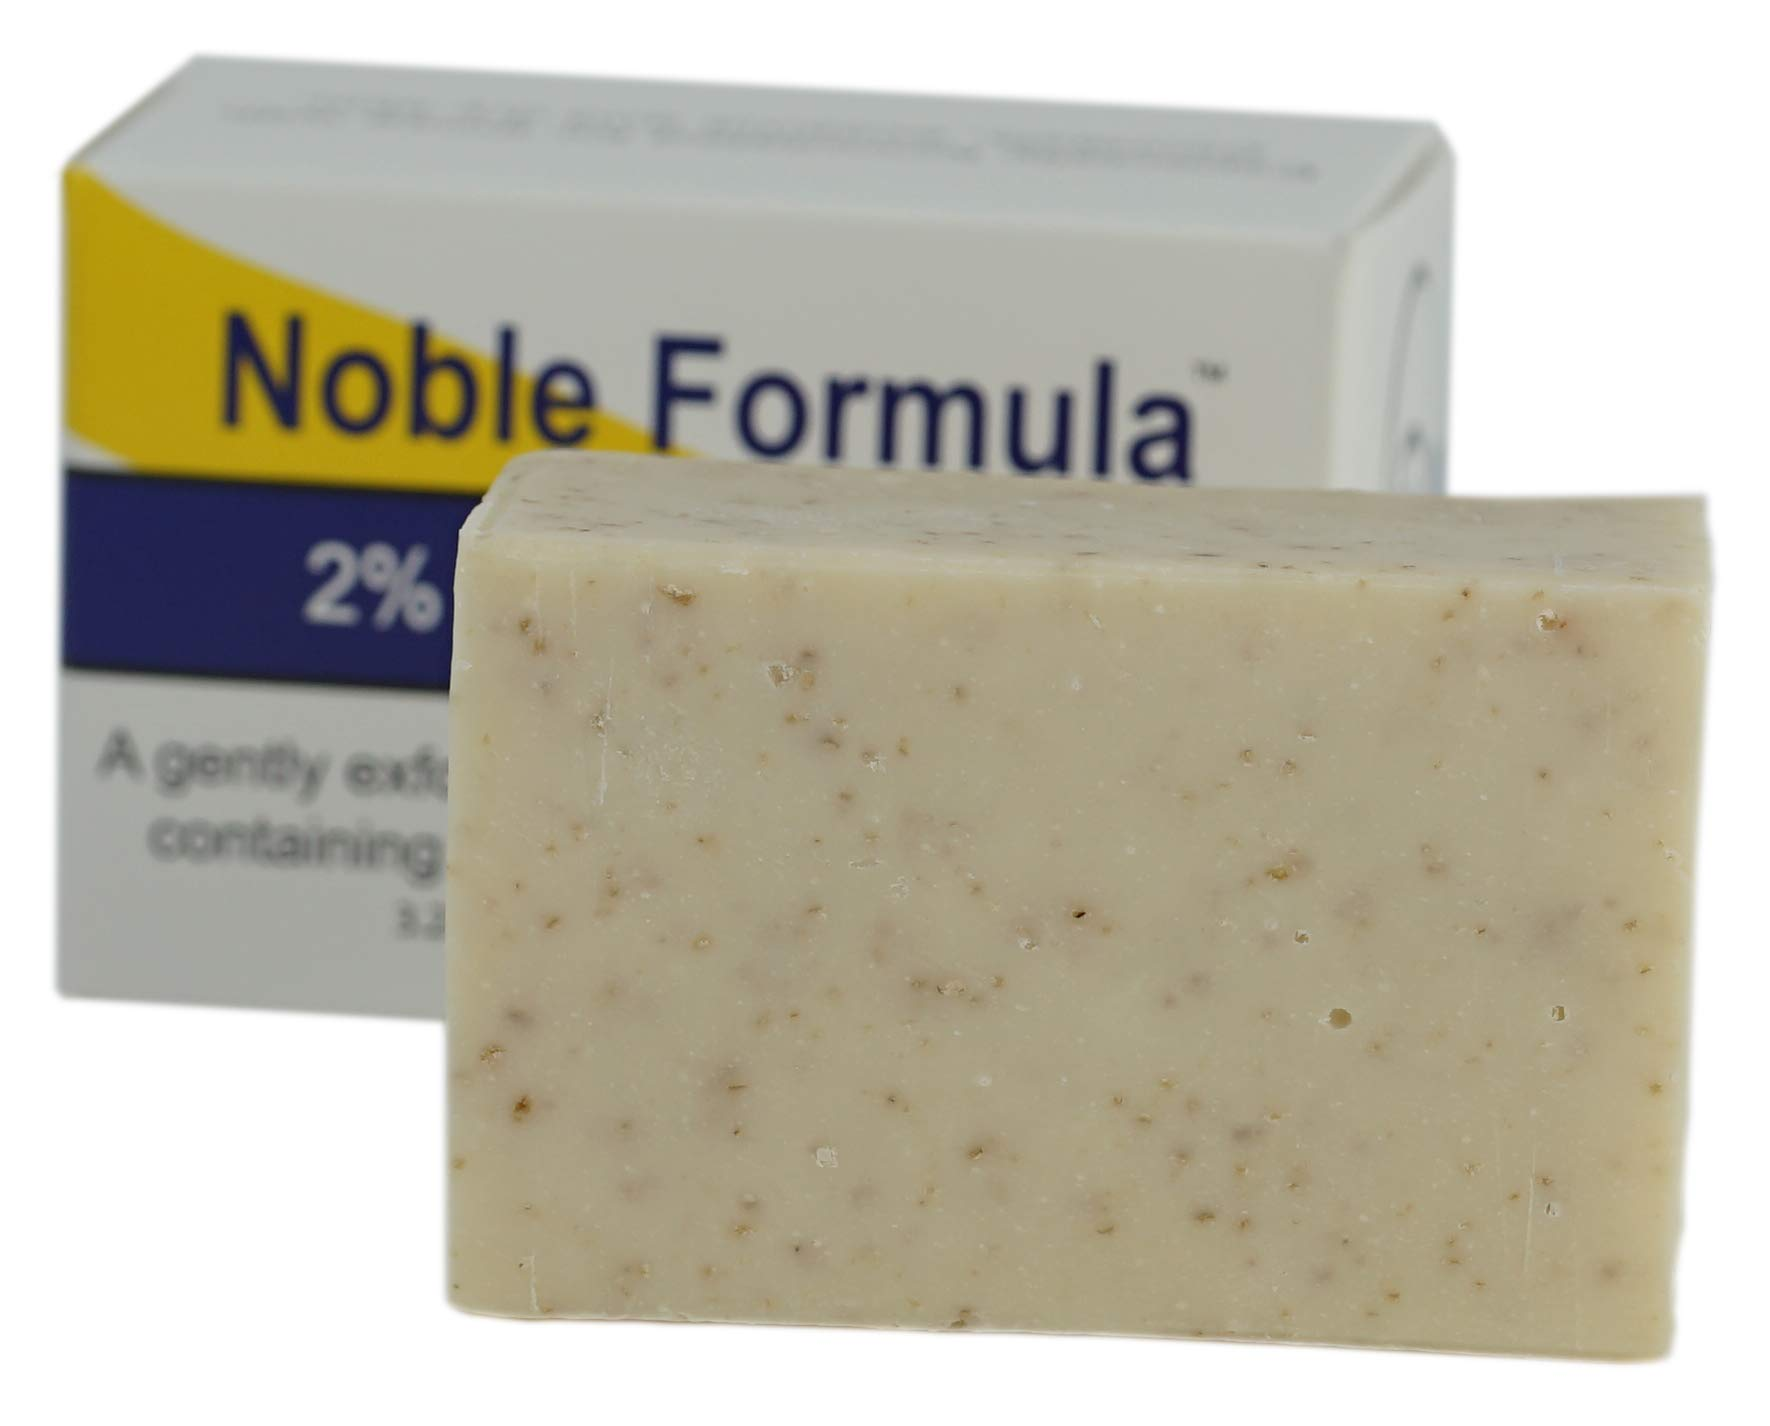 Noble Formula 2% Pyrithione Zinc (ZnP) Vegan Mango, Cocoa Butter, Olive Oil Bar Soap, (3 Bars in 1 Box), Total 9 oz